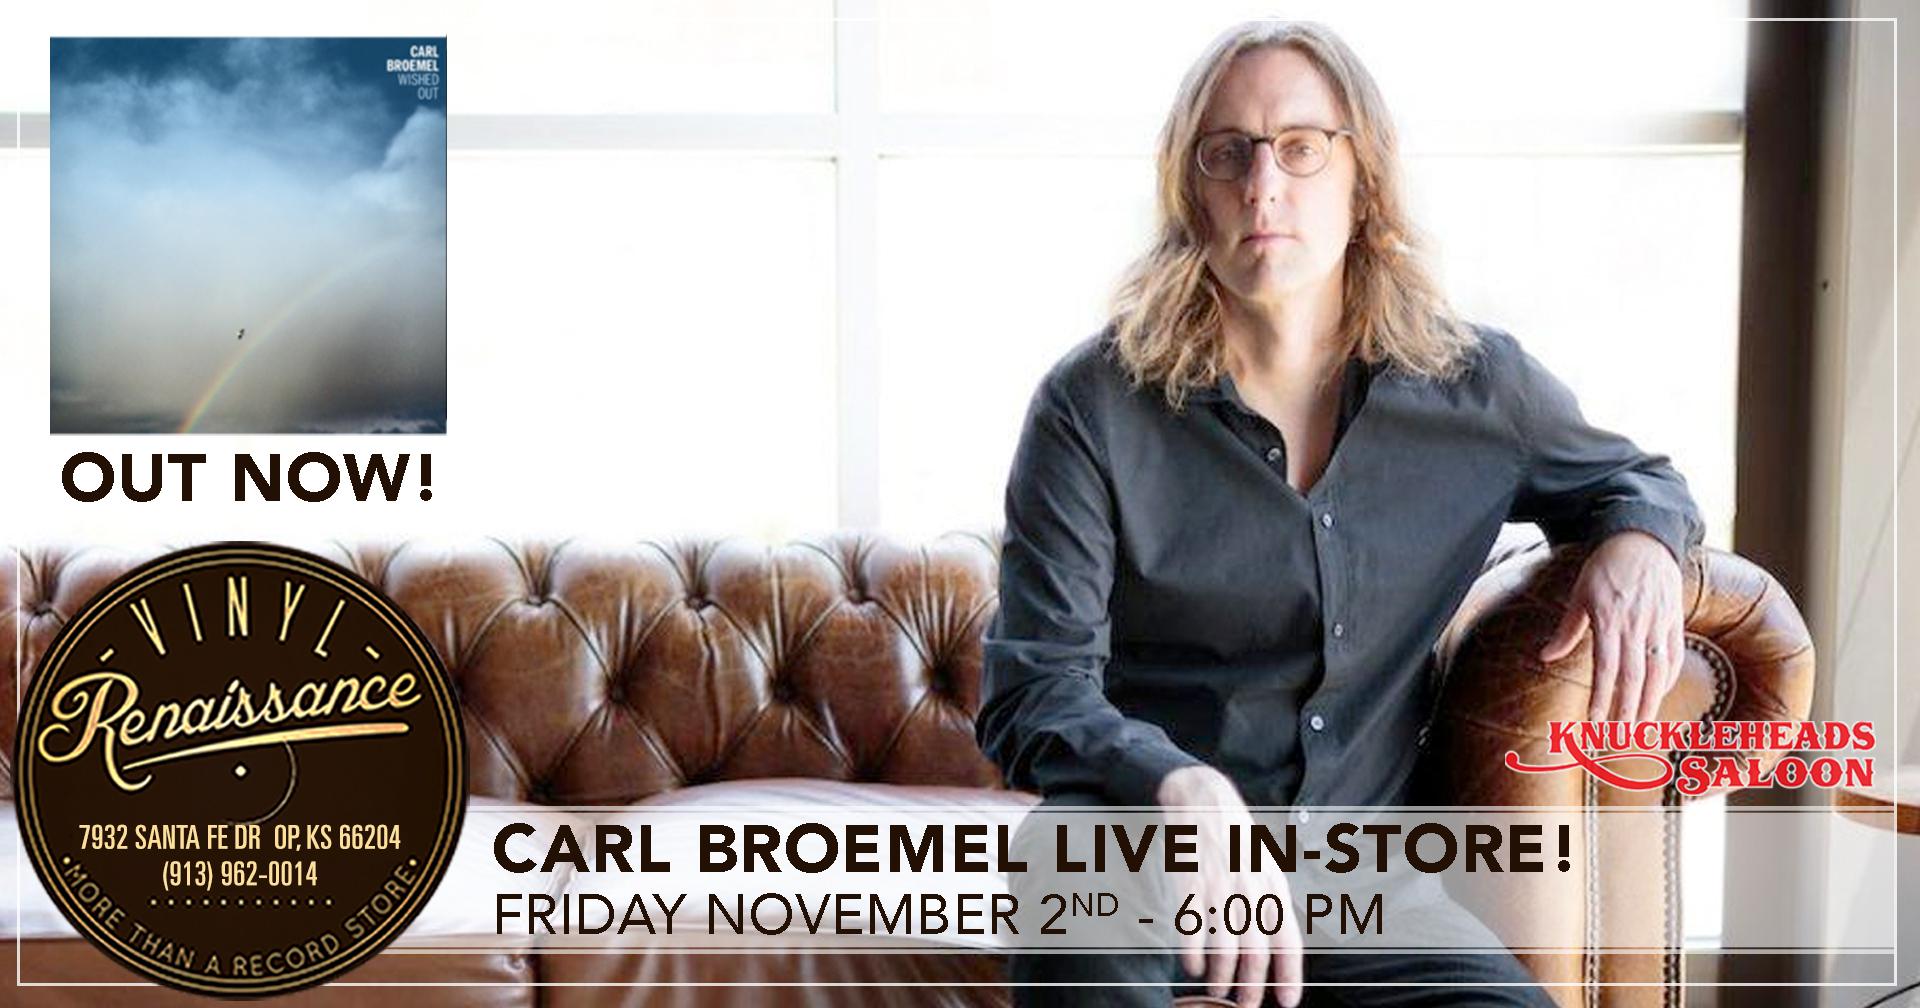 Carl Broemel Live In-Store!